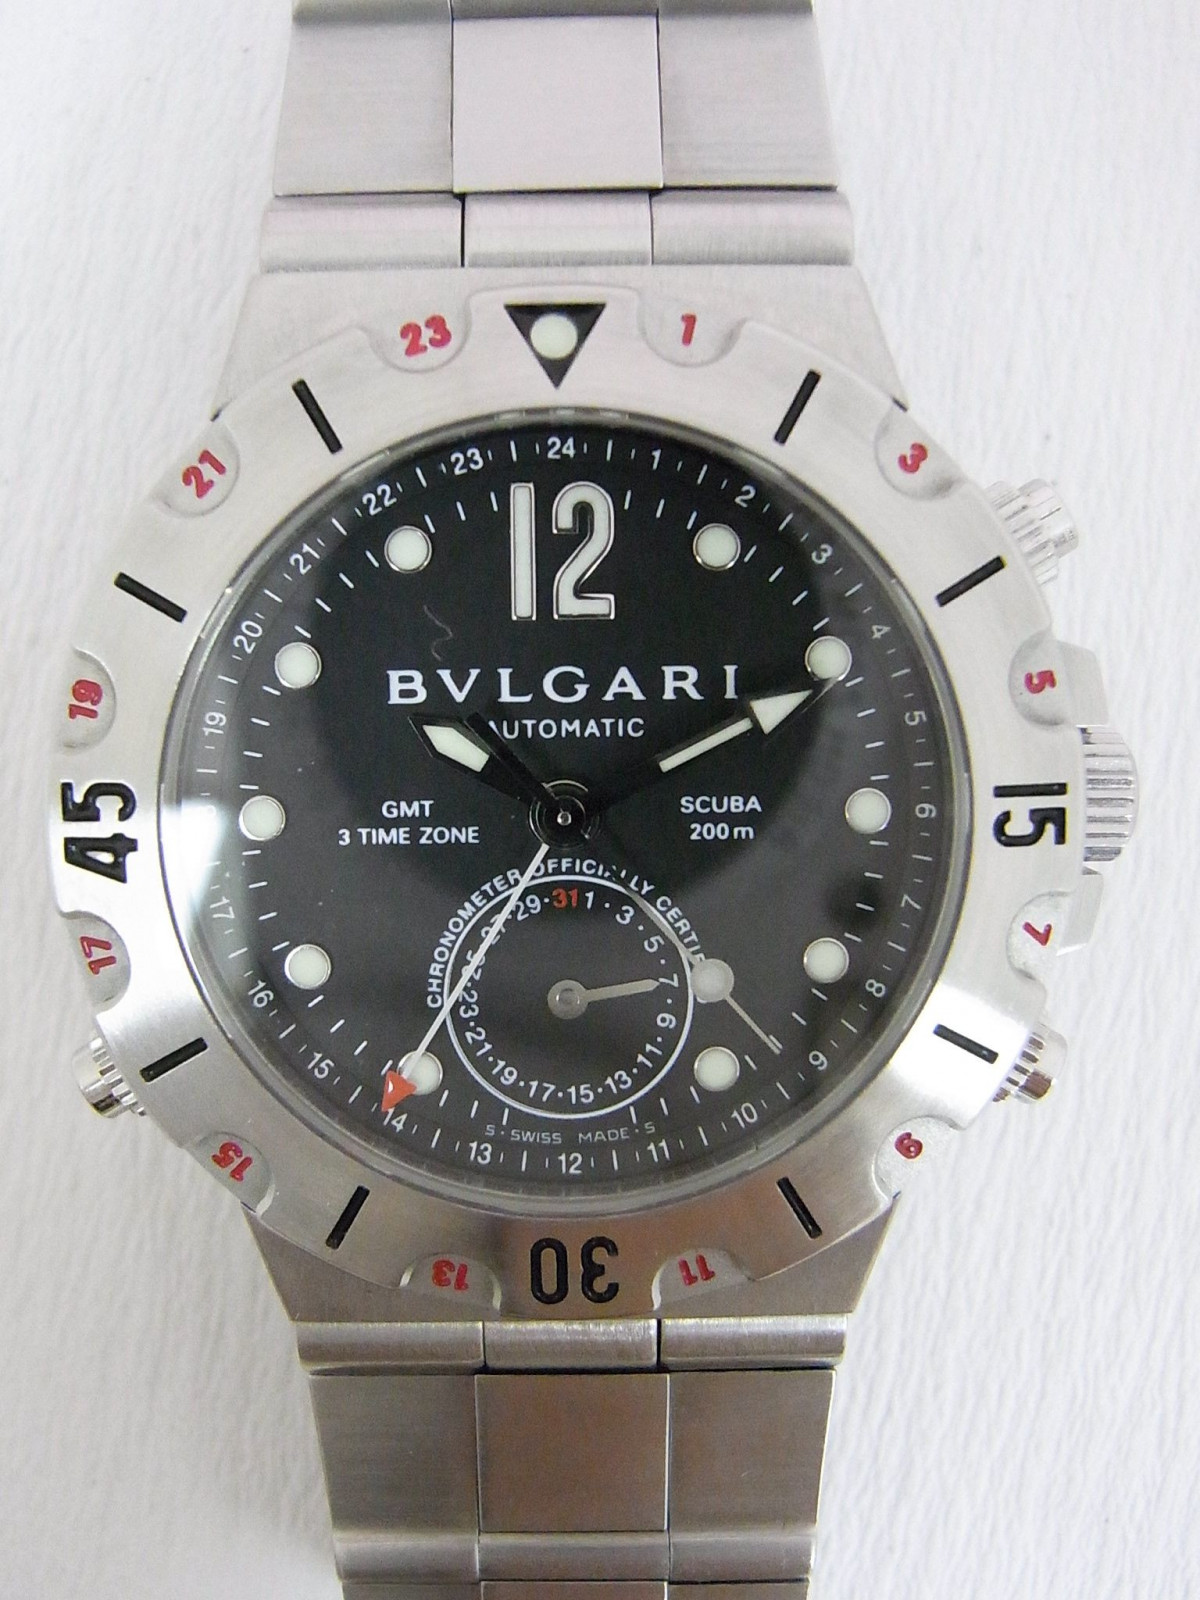 77c8fb996c7 Bvlgari Diagono SD38SGMT relógio usados (€328) - Timepeaks